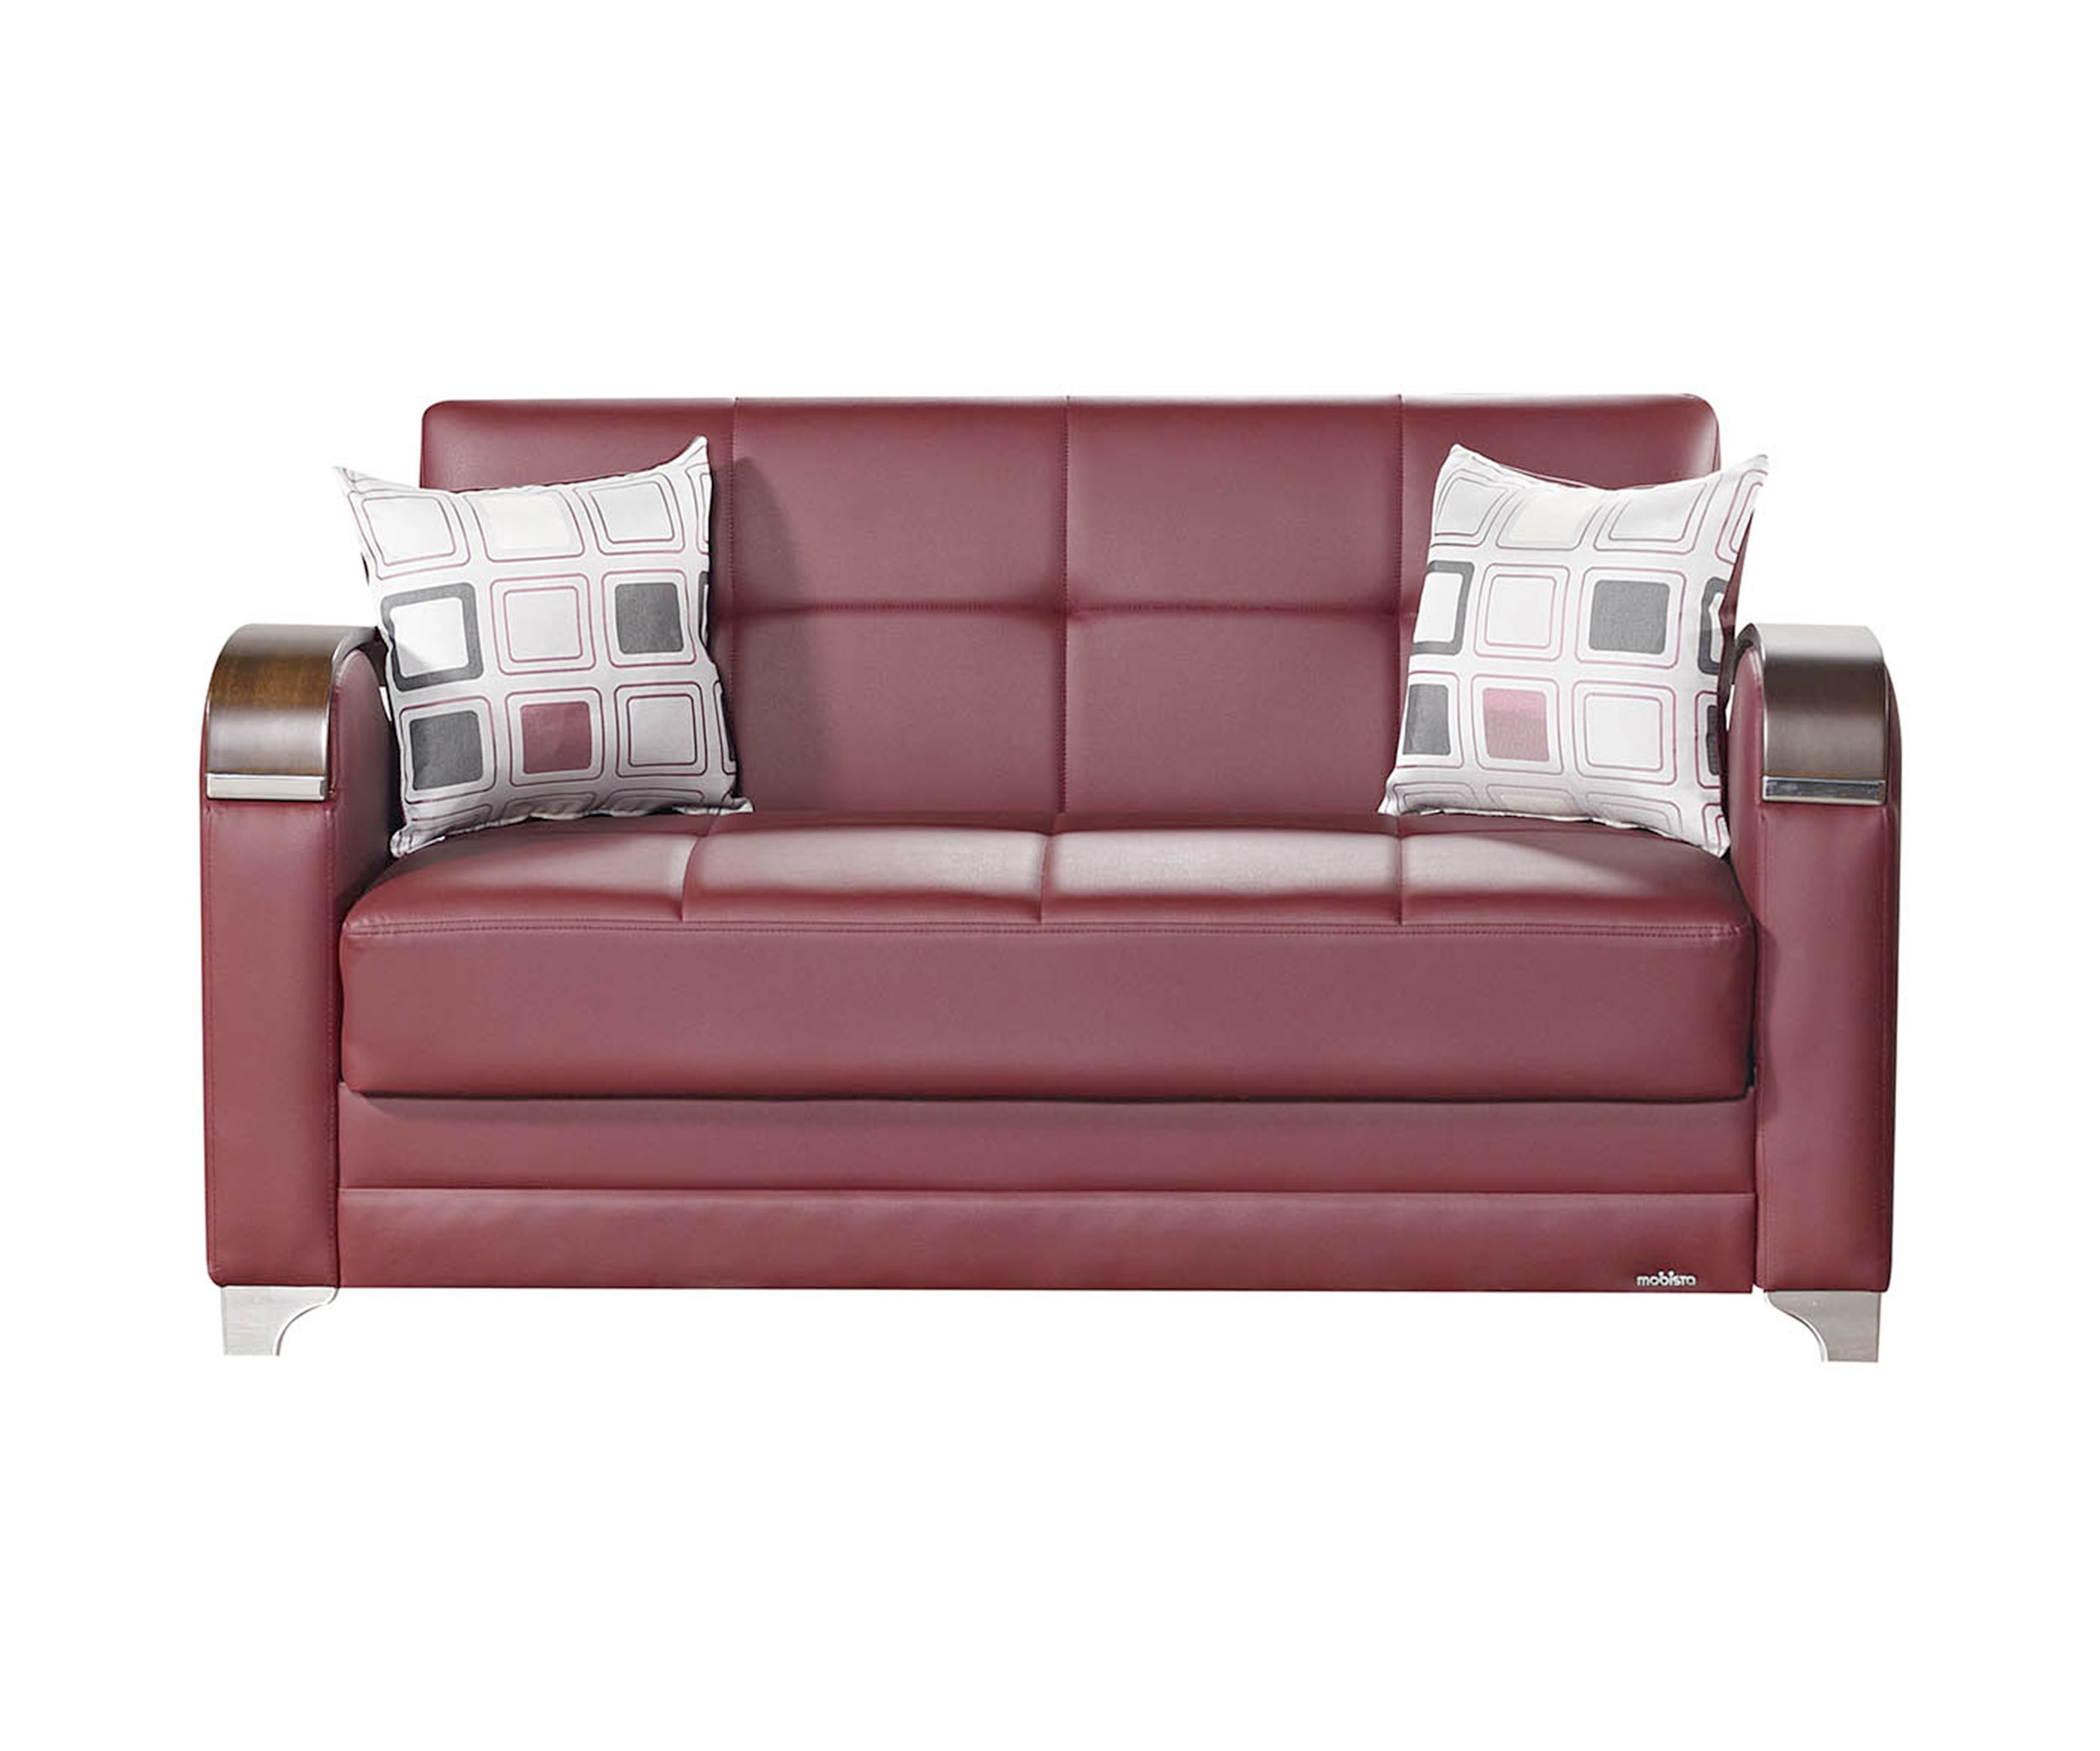 leatherette sofa durability super store fire etro prestige burgundy loveseat bed by mobista